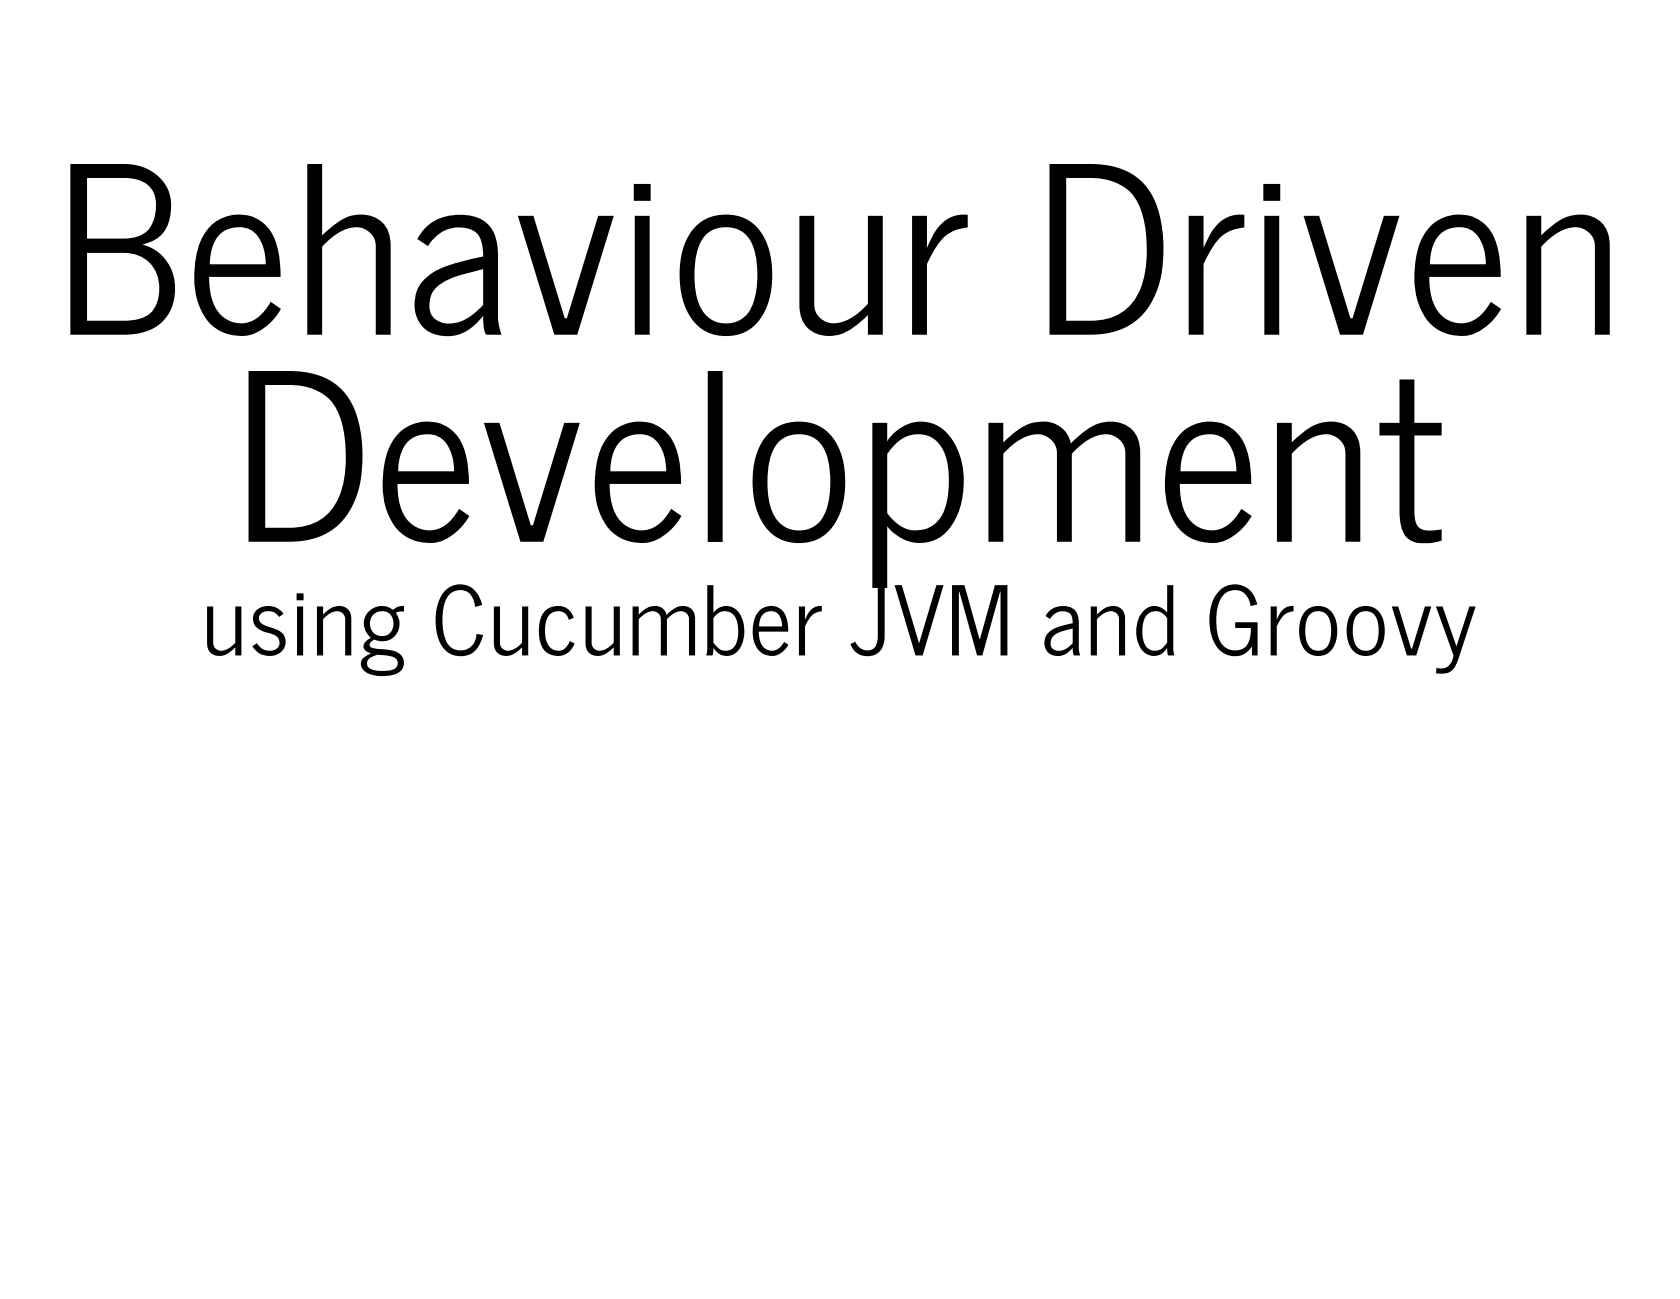 BDD Using Cucumber JVM and Groovy